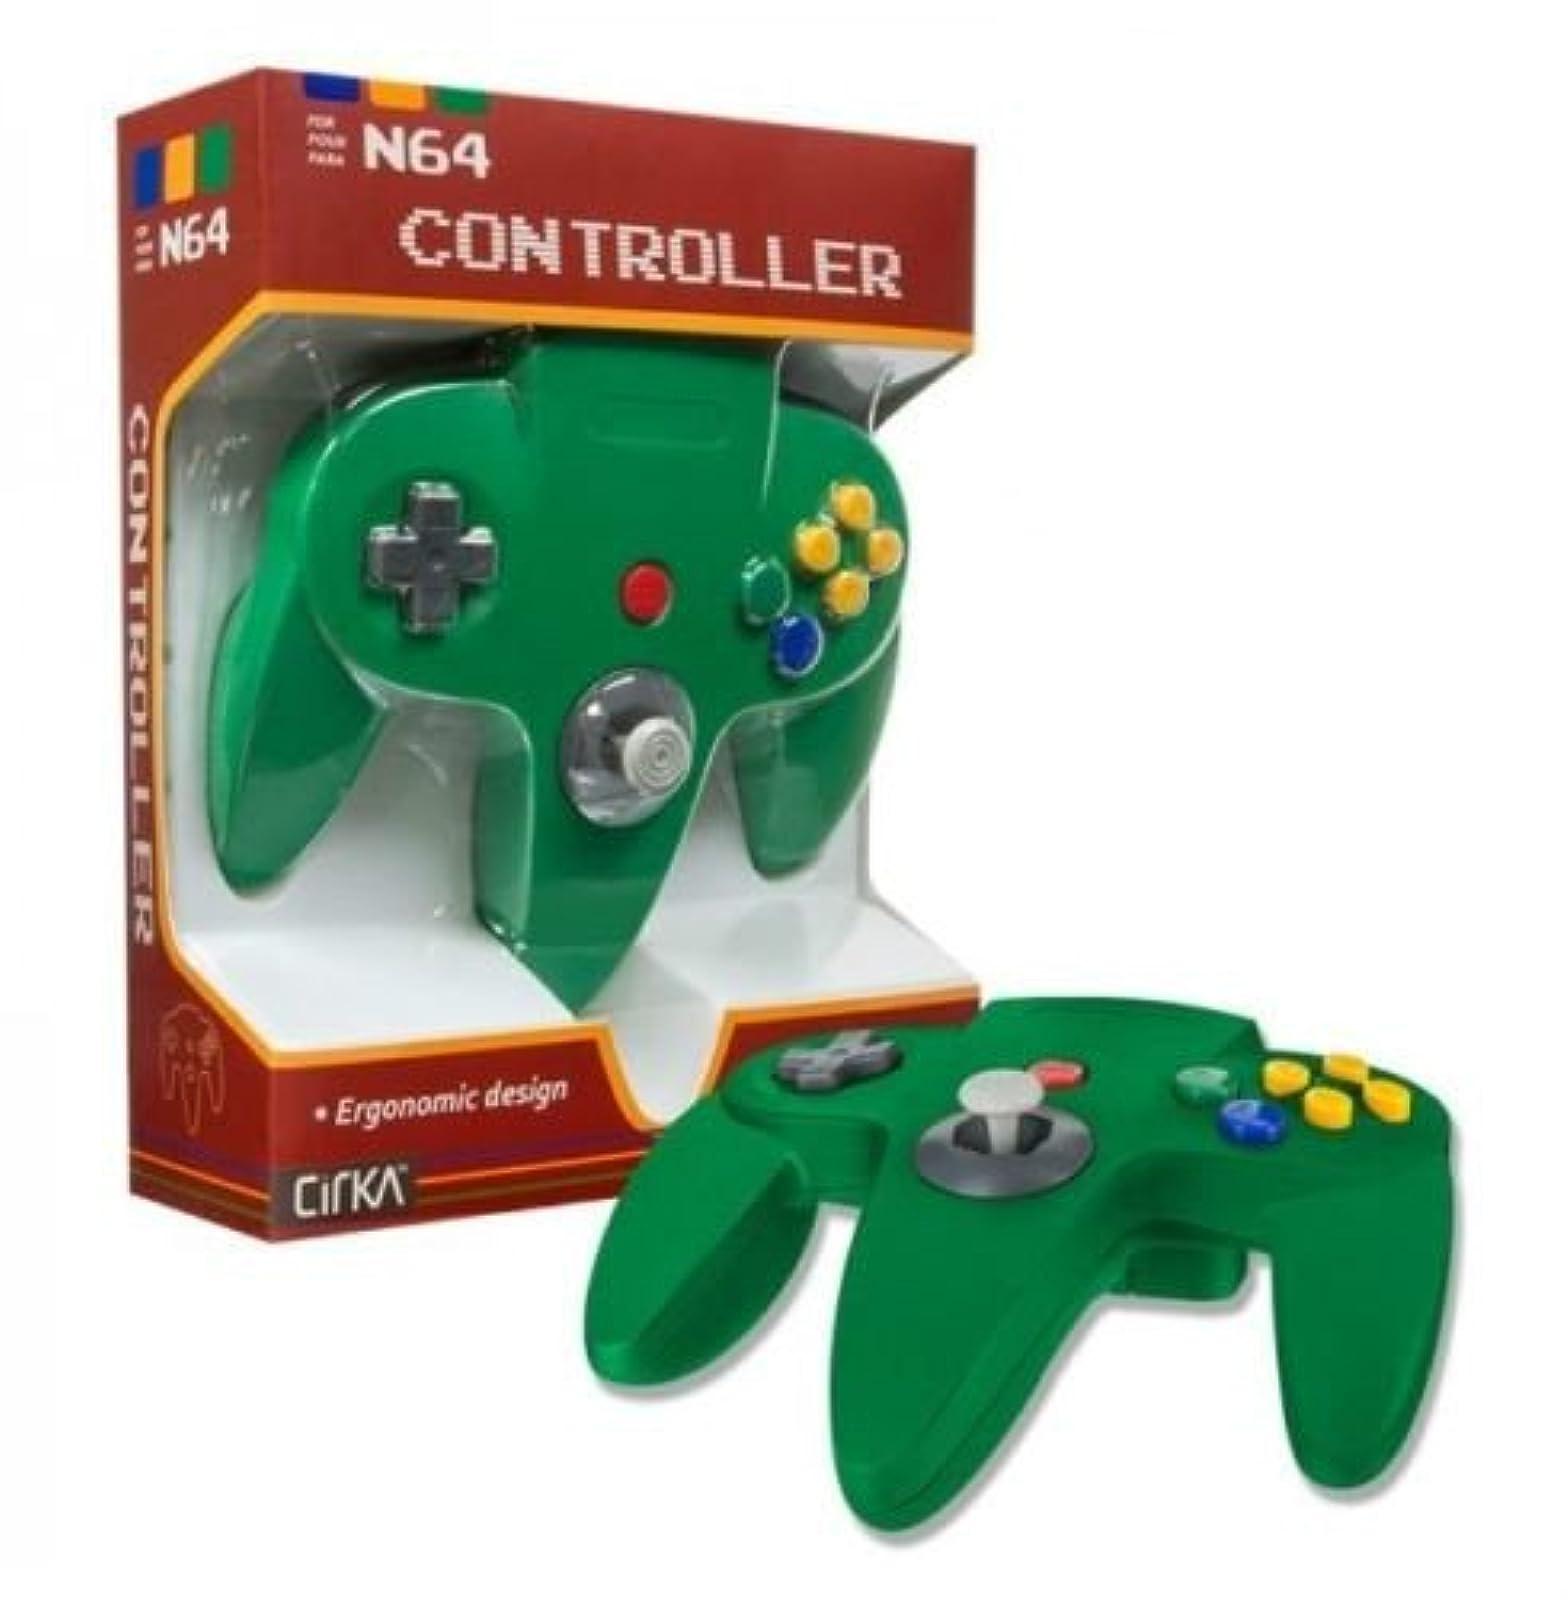 Controller For Nintendo 64 Green N64 Joypad